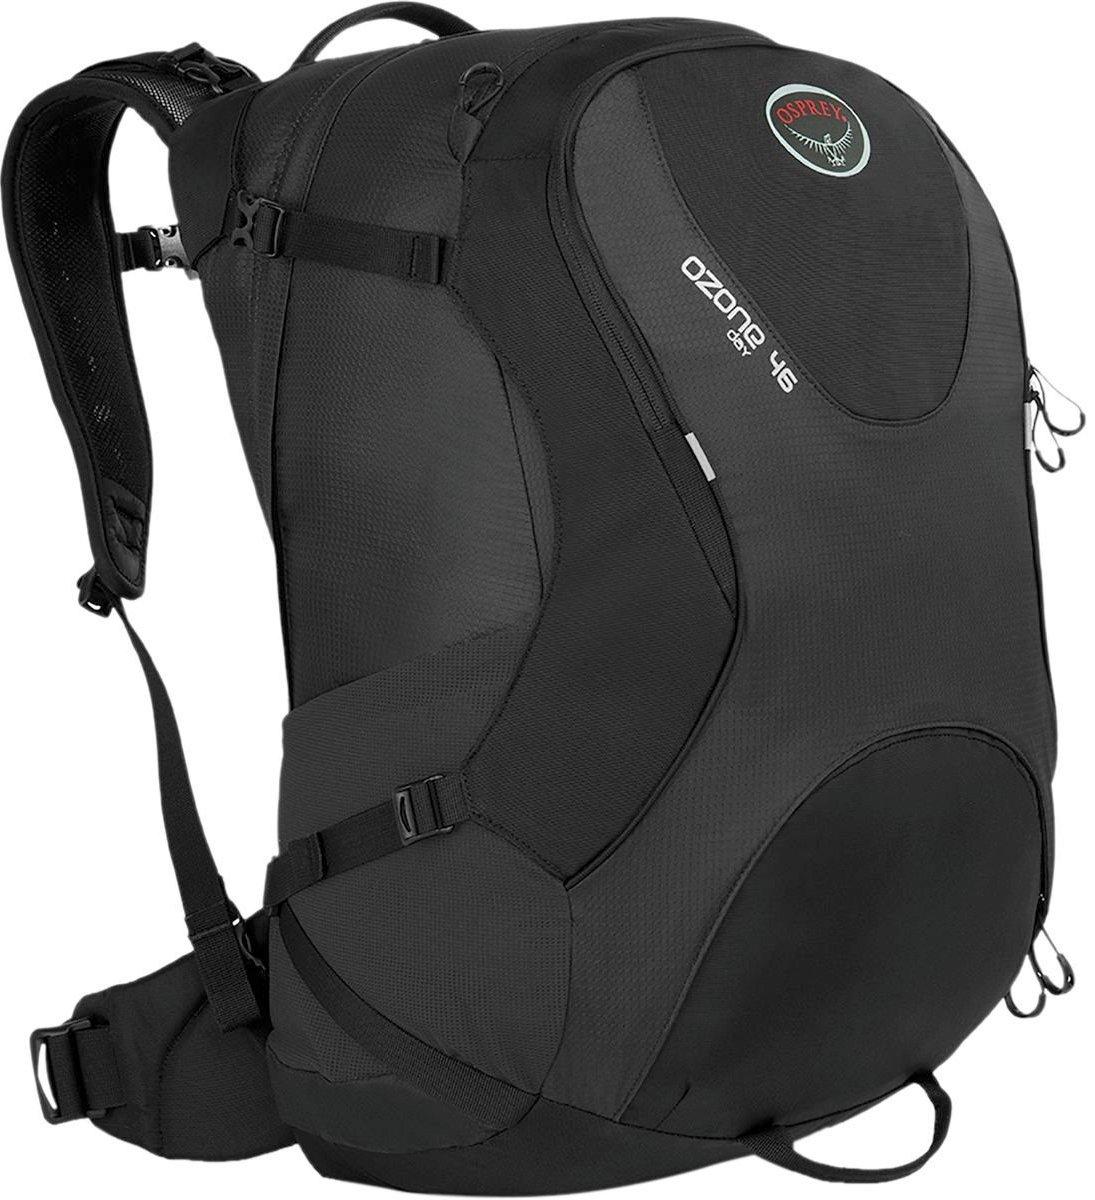 Osprey 登機包/行李袋/旅行包/旅遊行李後背包 Ozone Travel Pack 46 肩帶可收納 黑/台北山水